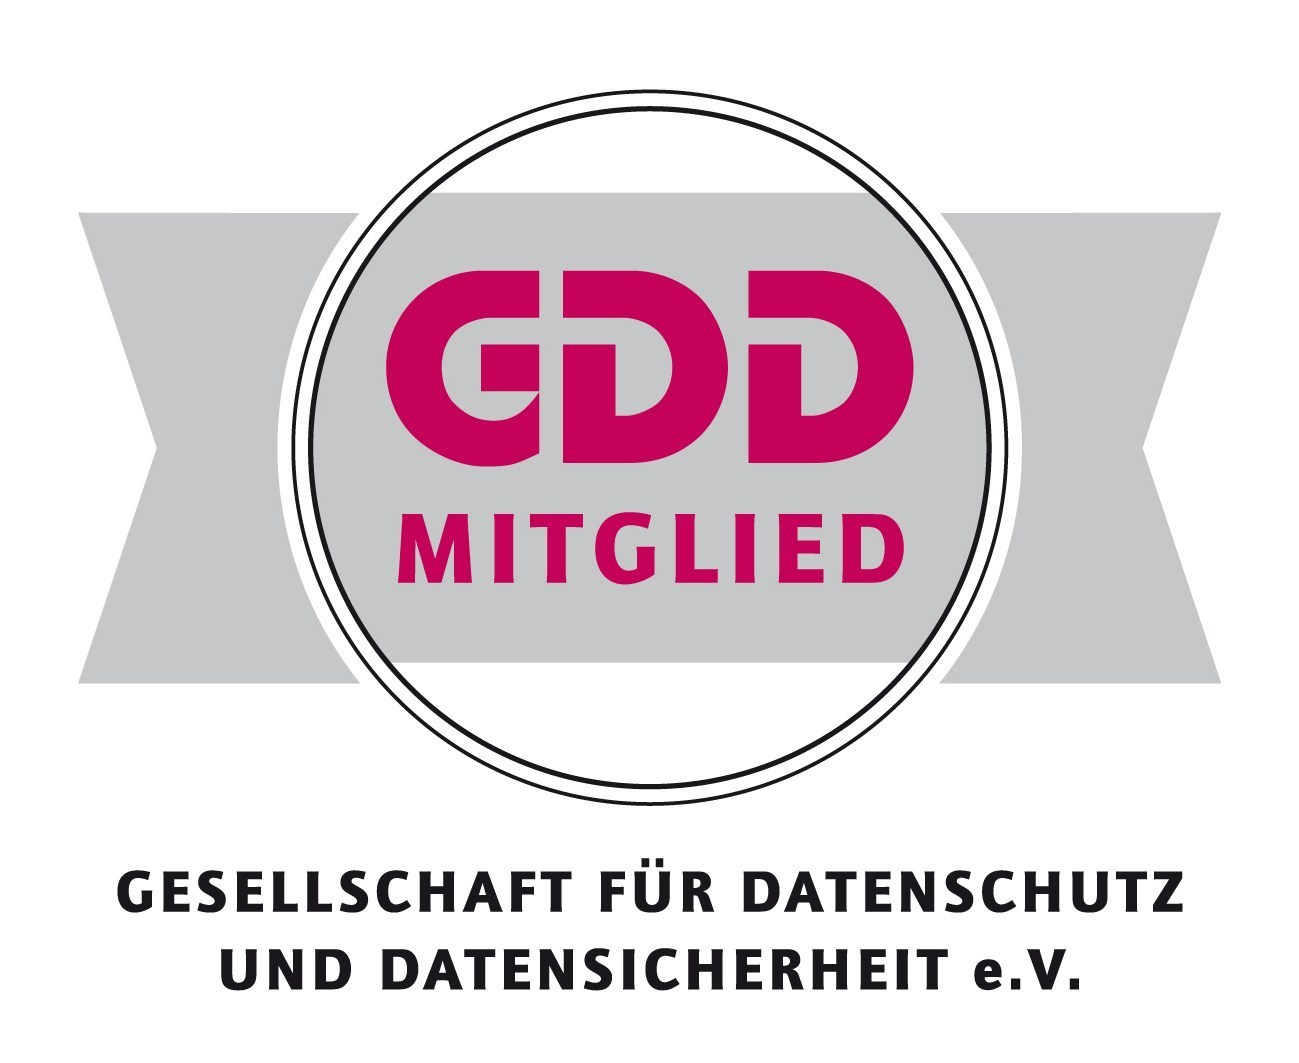 Mitglied GDD.